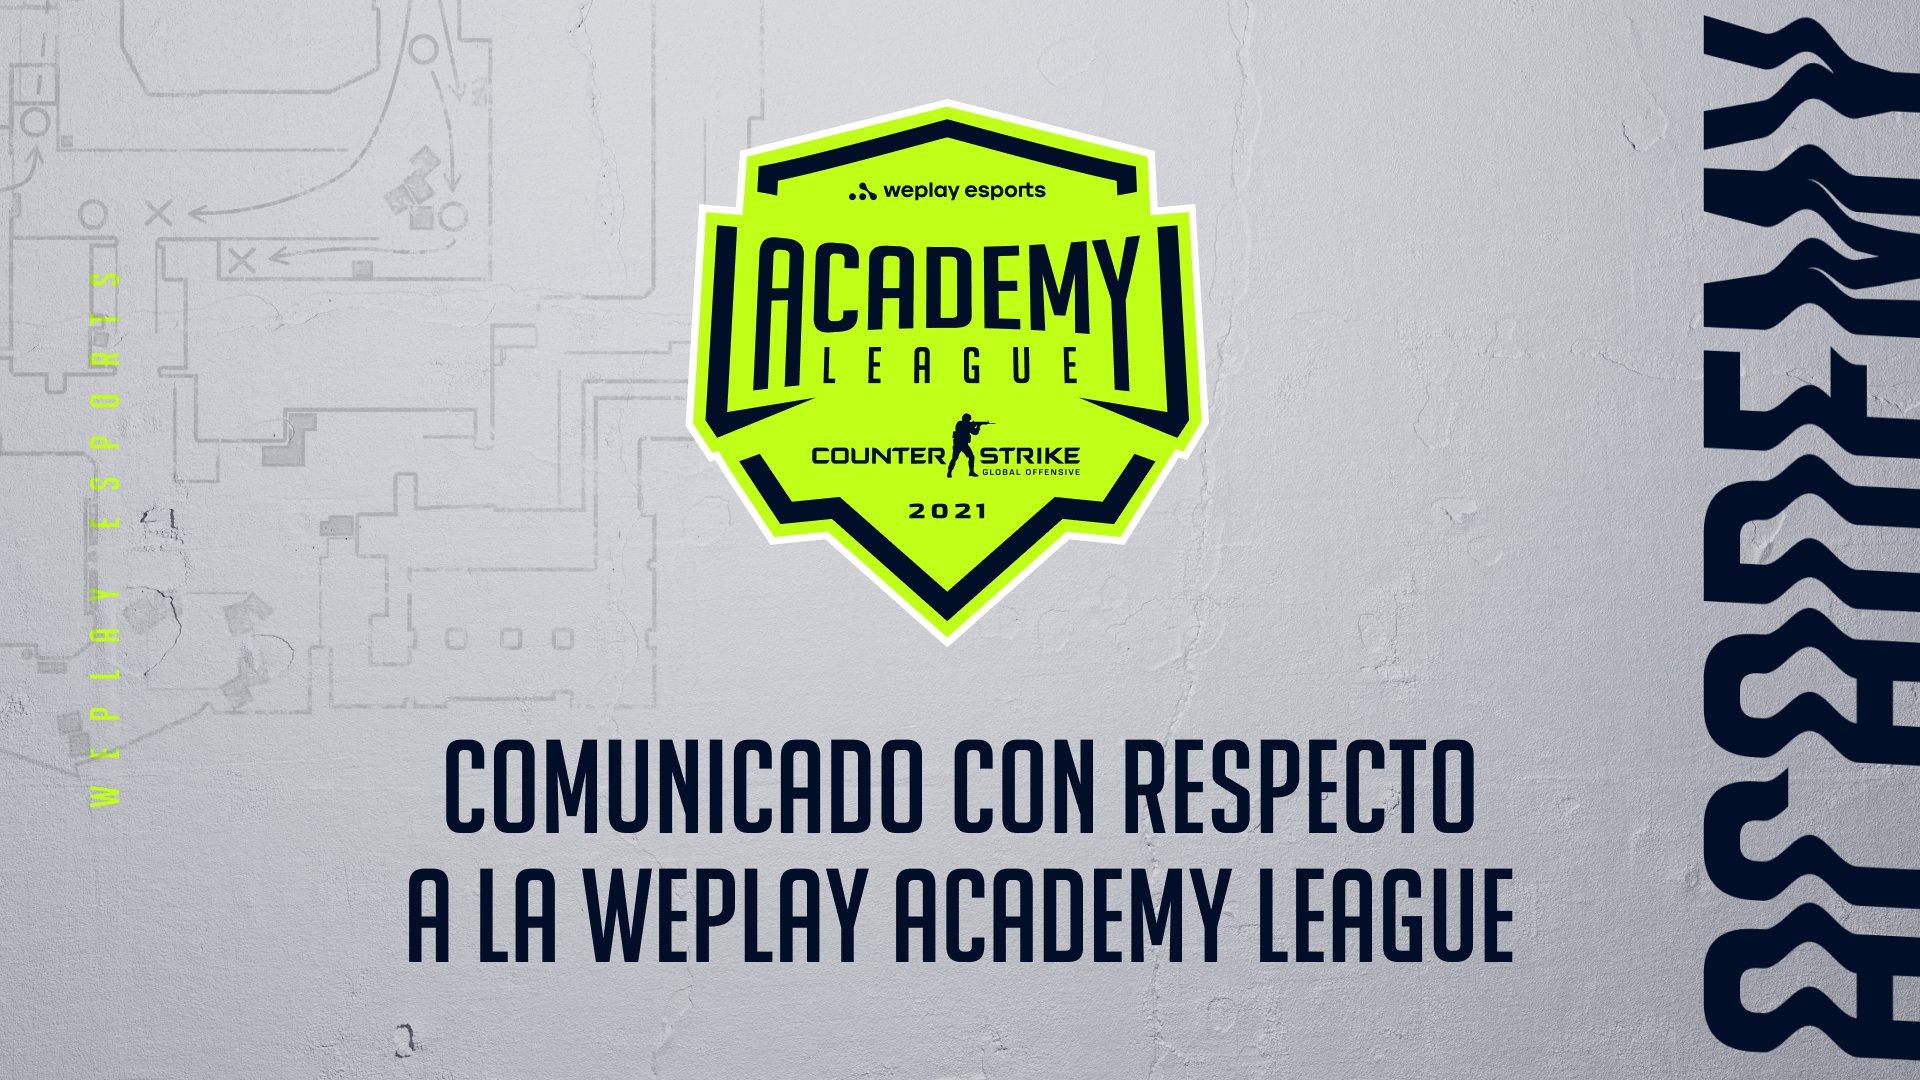 Comunicado con respecto a la WePlay Academy League. Imagen: WePlay Holding